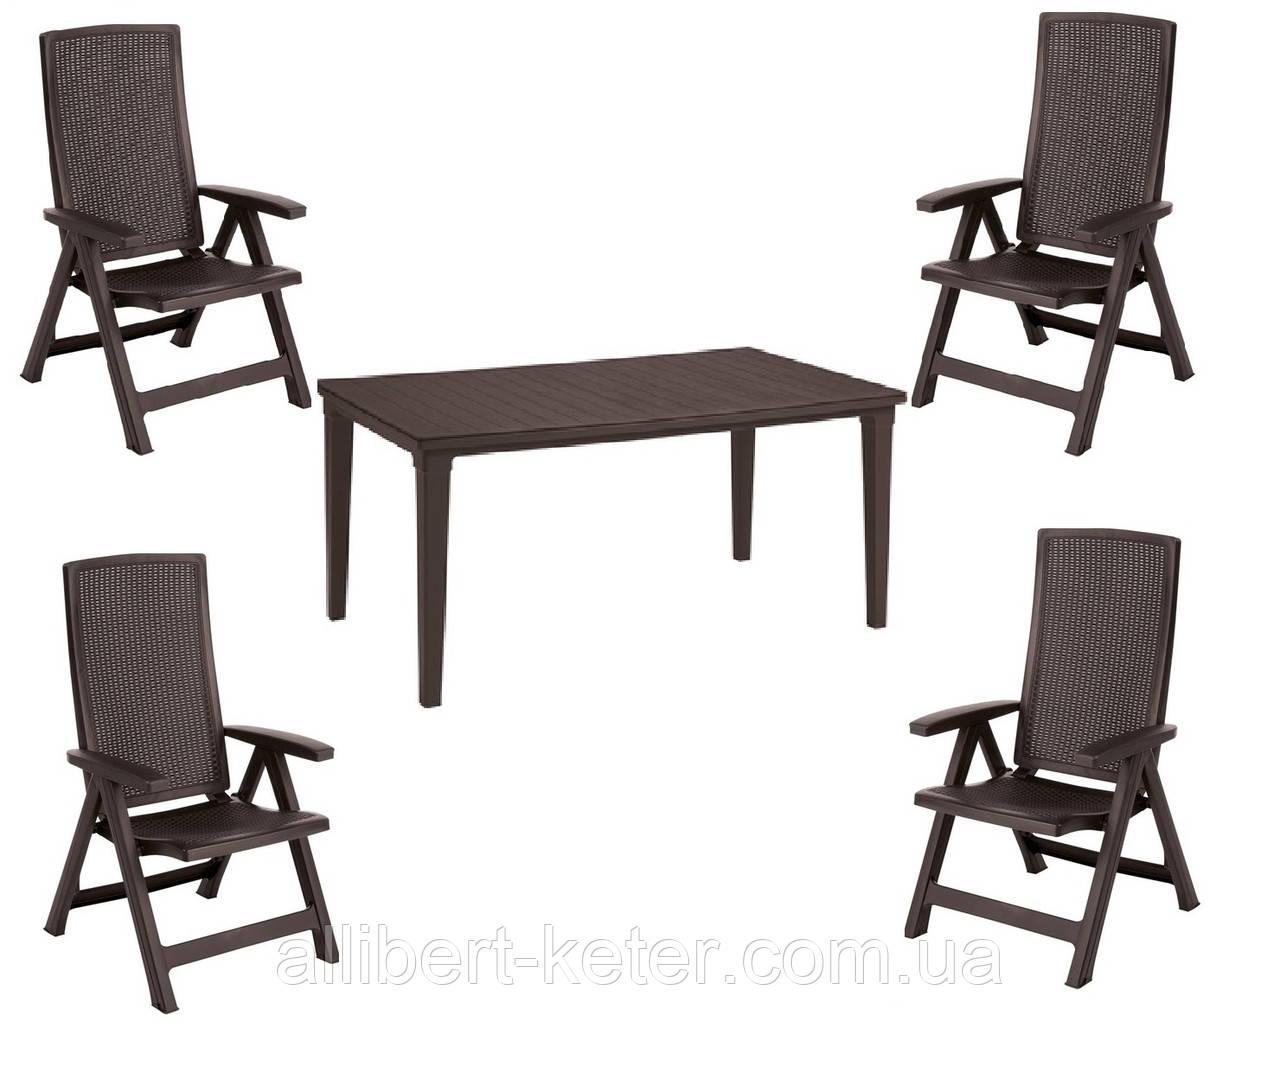 Комплект садових меблів MONTREAL WITH FUTURA DINING SET темно-коричневий (Keter)